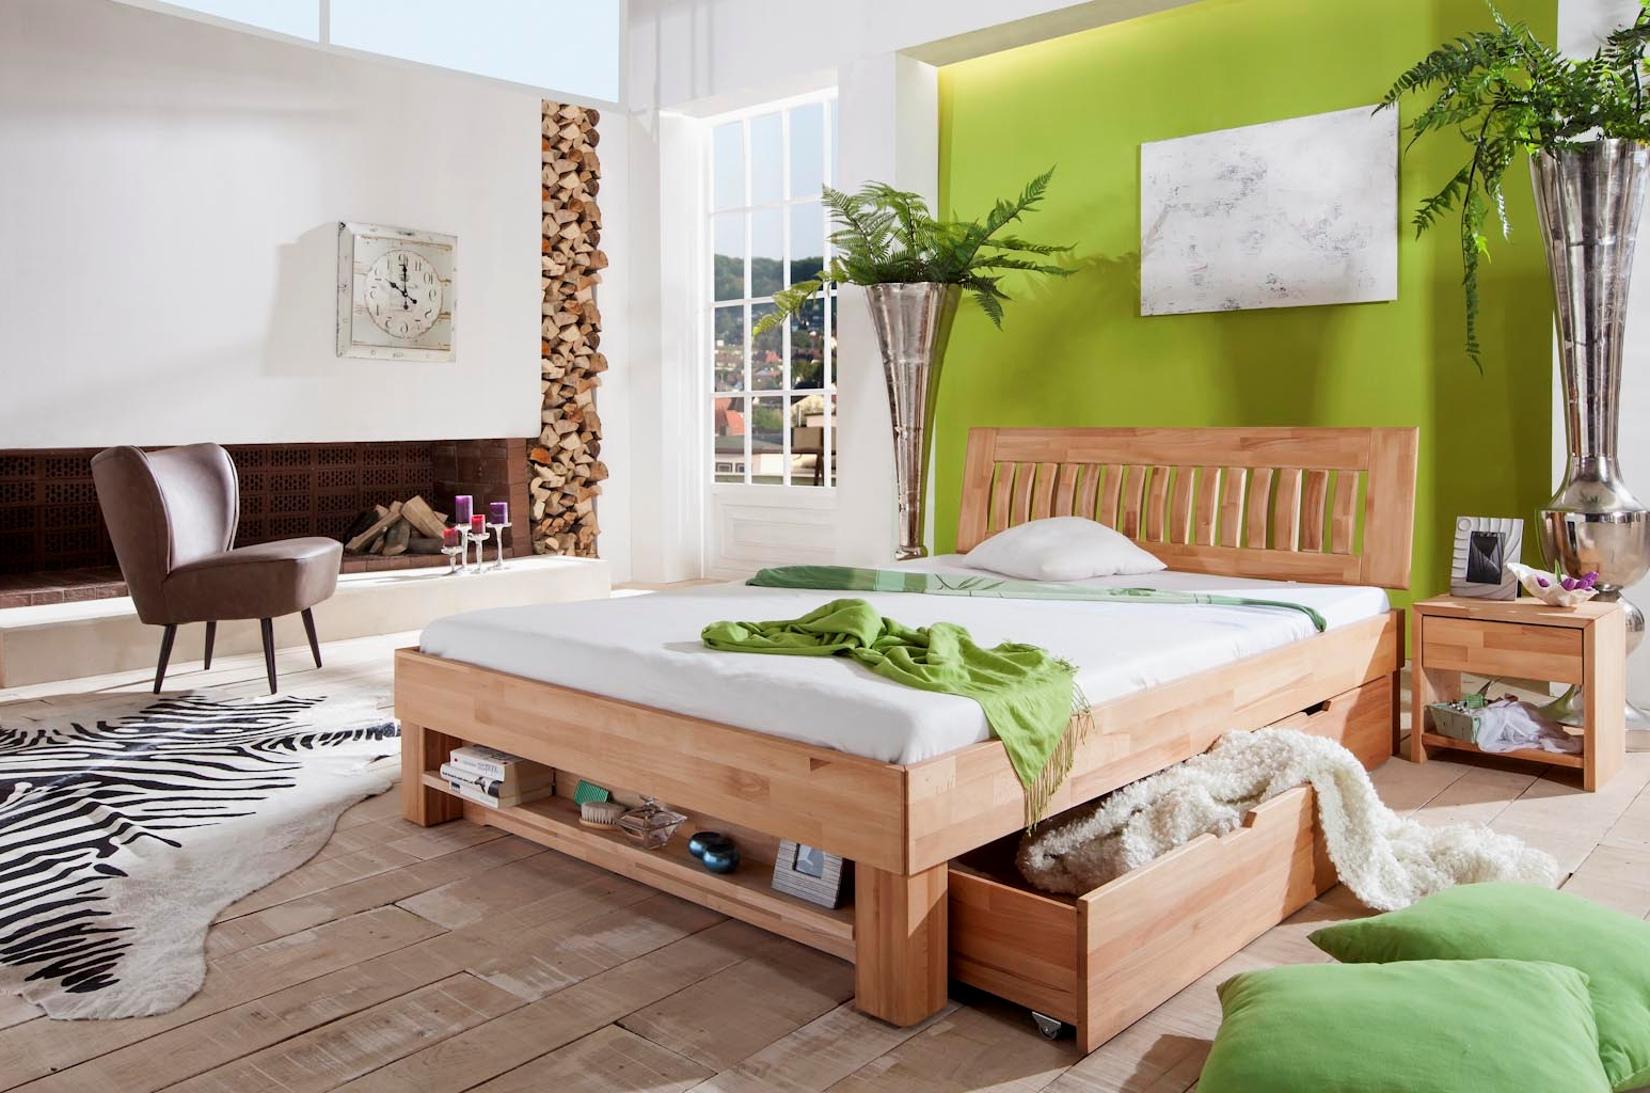 regal 120 cm breit massivholz ge lte kernbuche. Black Bedroom Furniture Sets. Home Design Ideas